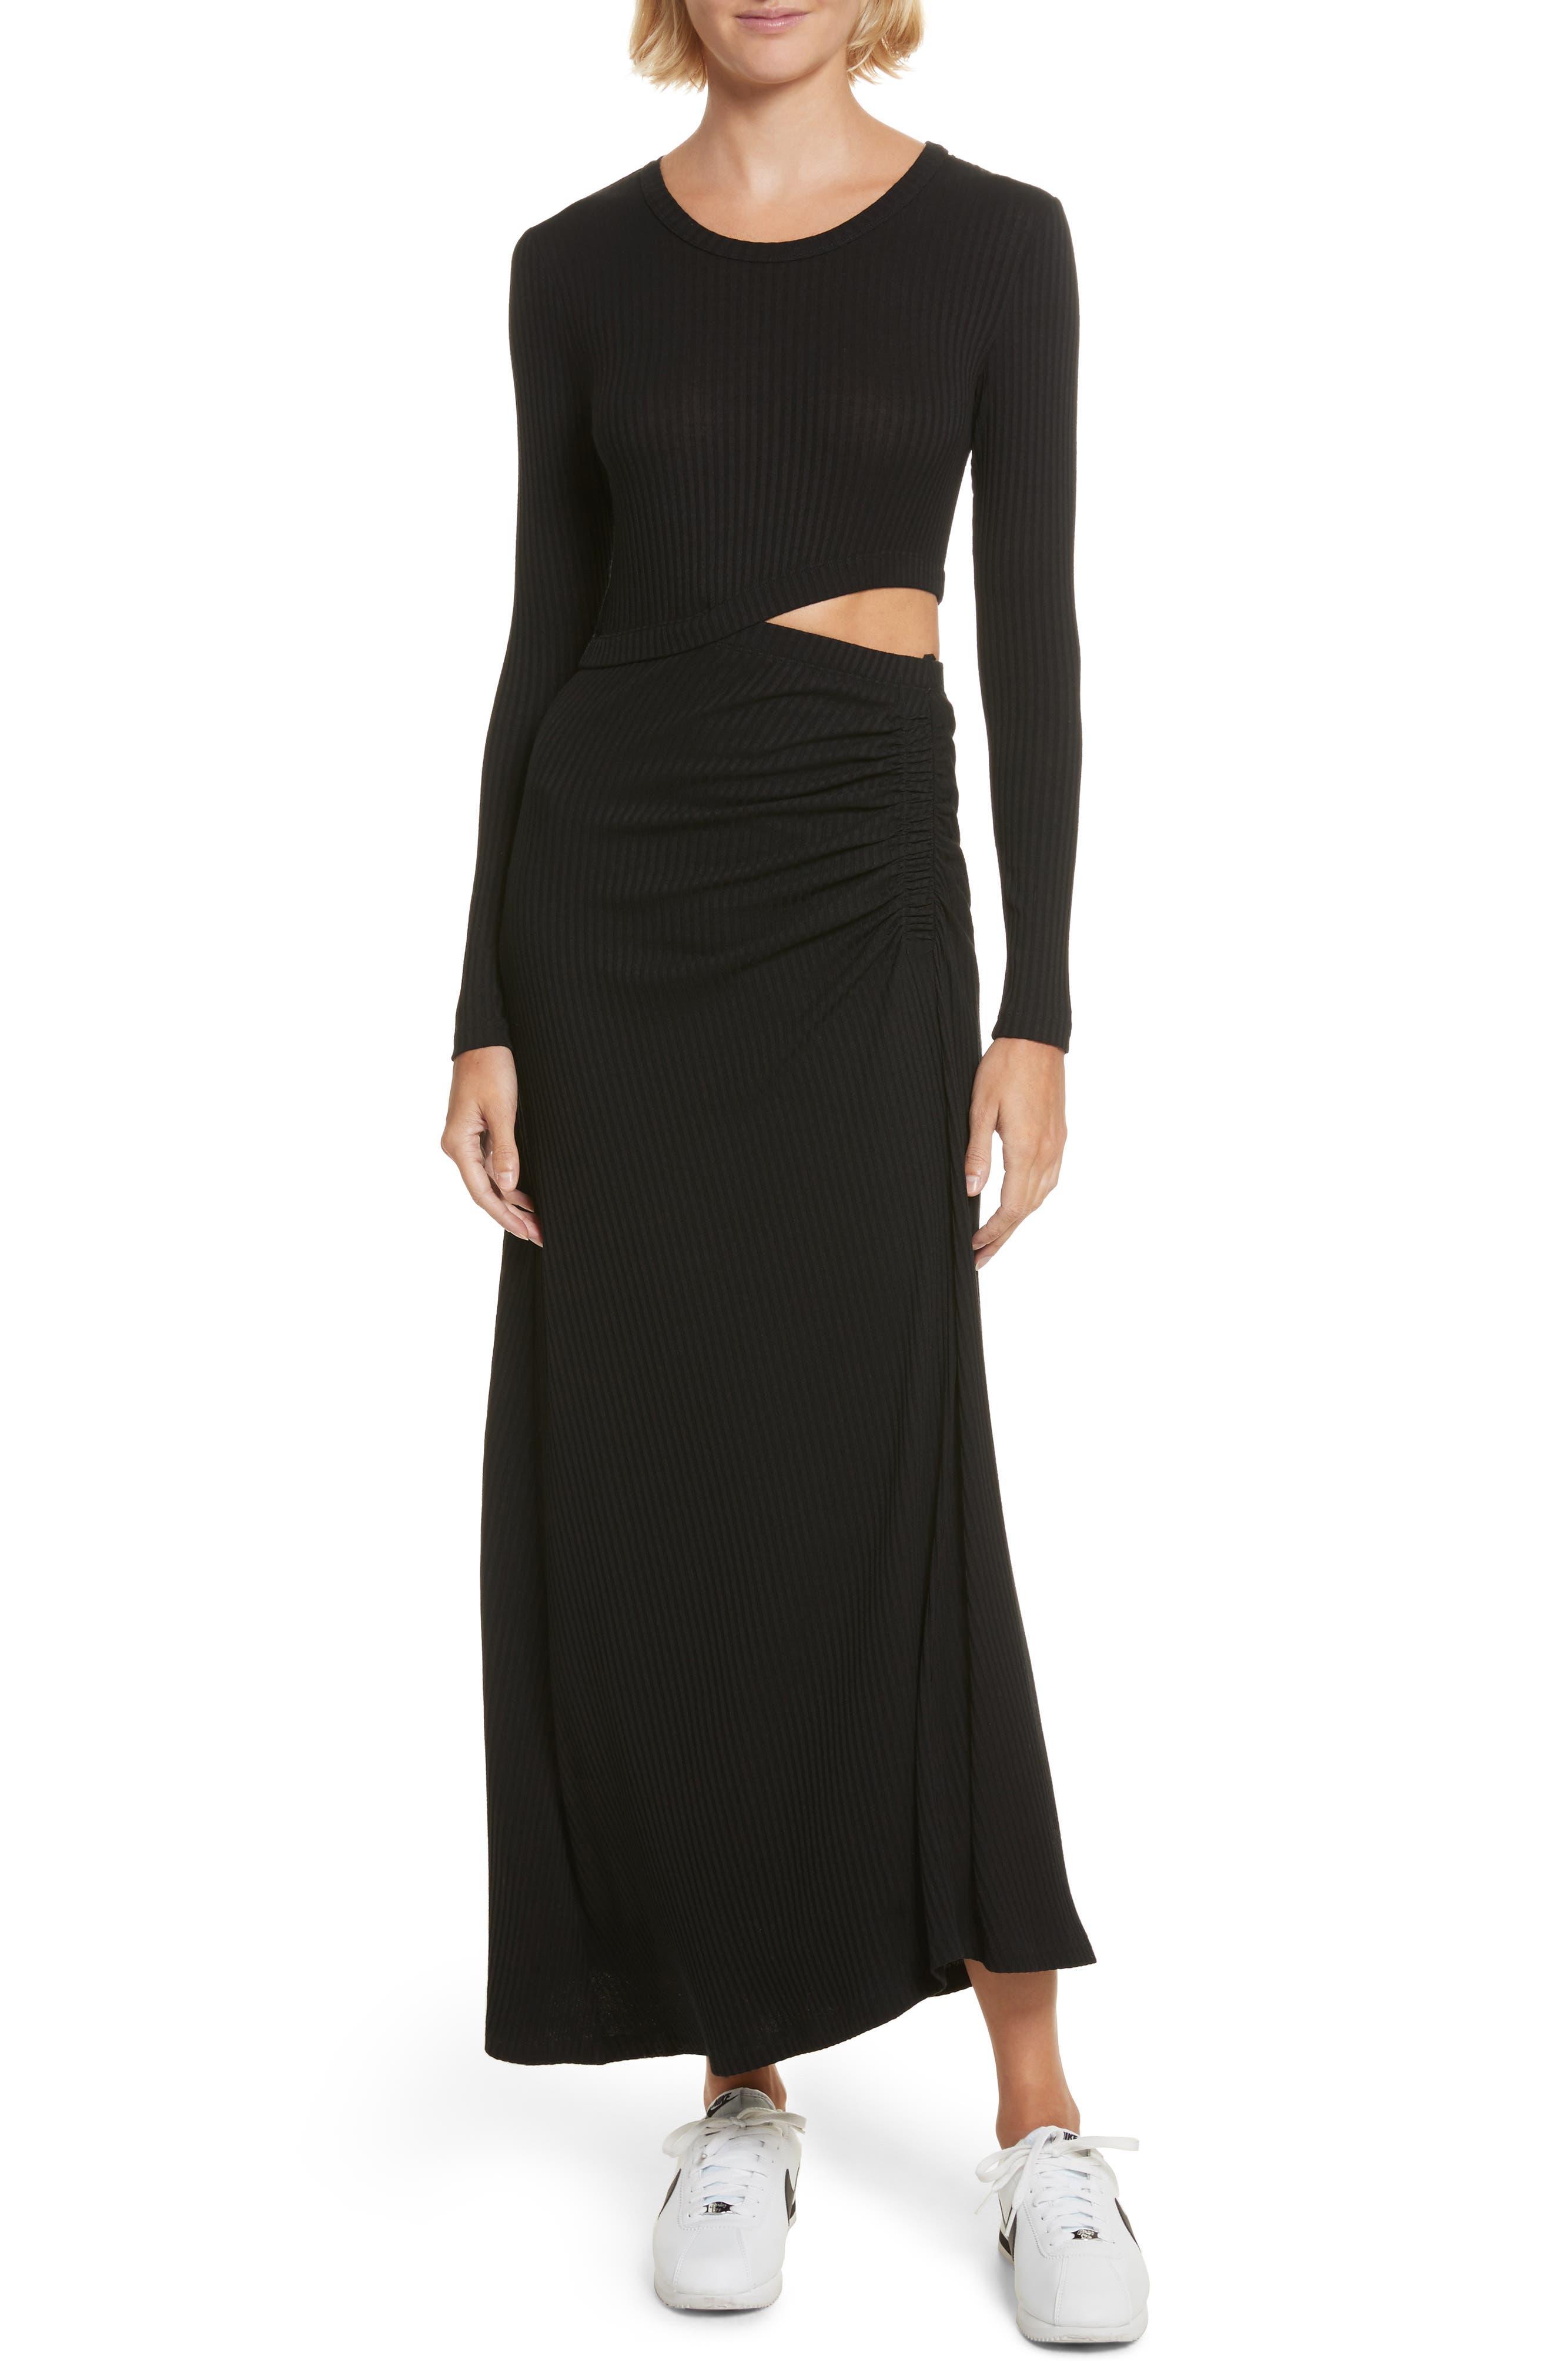 Rooney Cutout Dress,                             Main thumbnail 1, color,                             Black